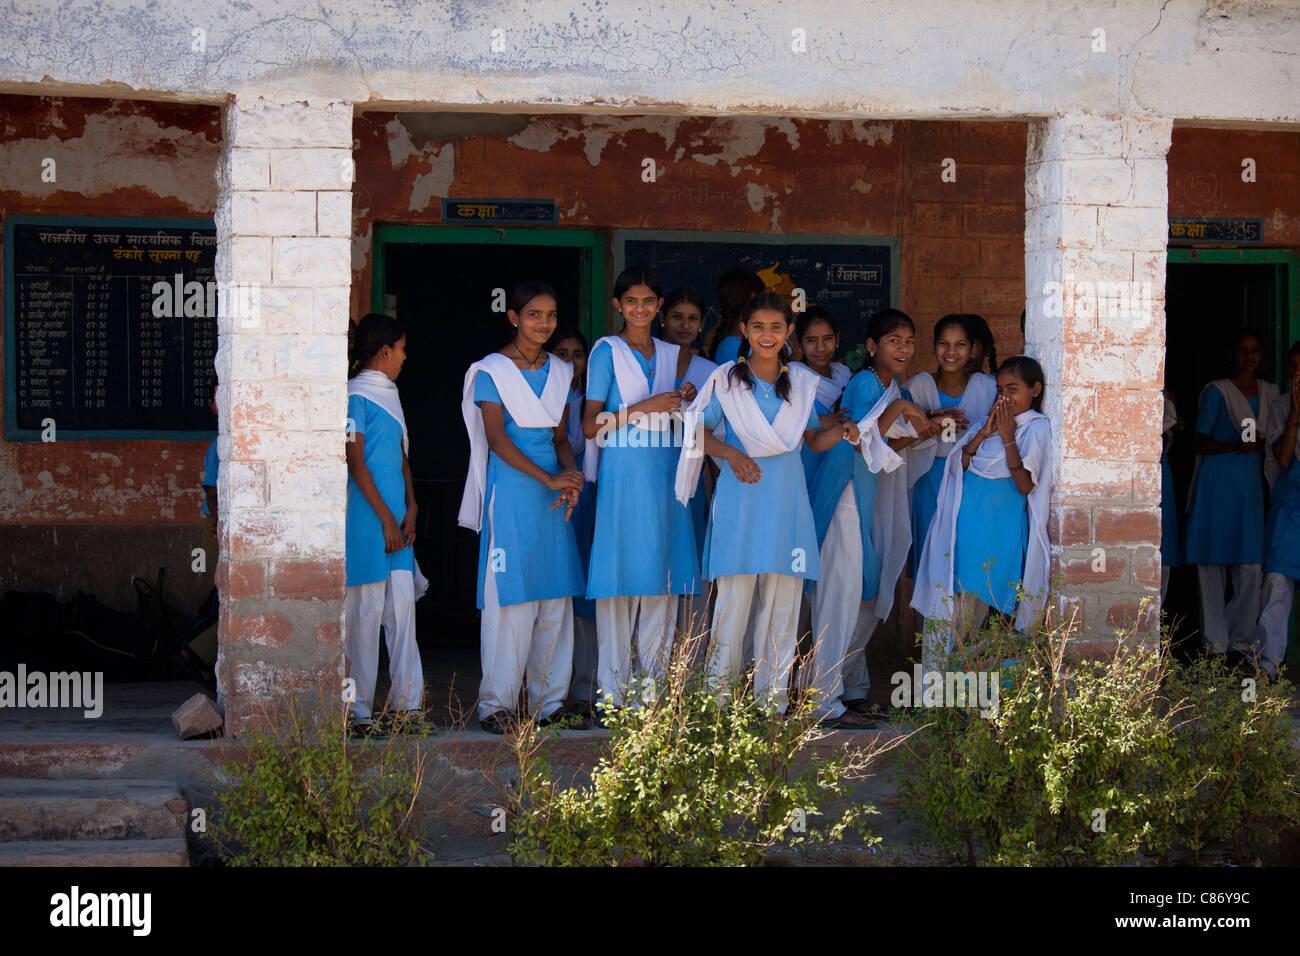 Indian Hindu schoolchildren at state school at Kaparda village in Rajasthan, Northern India - Stock Image